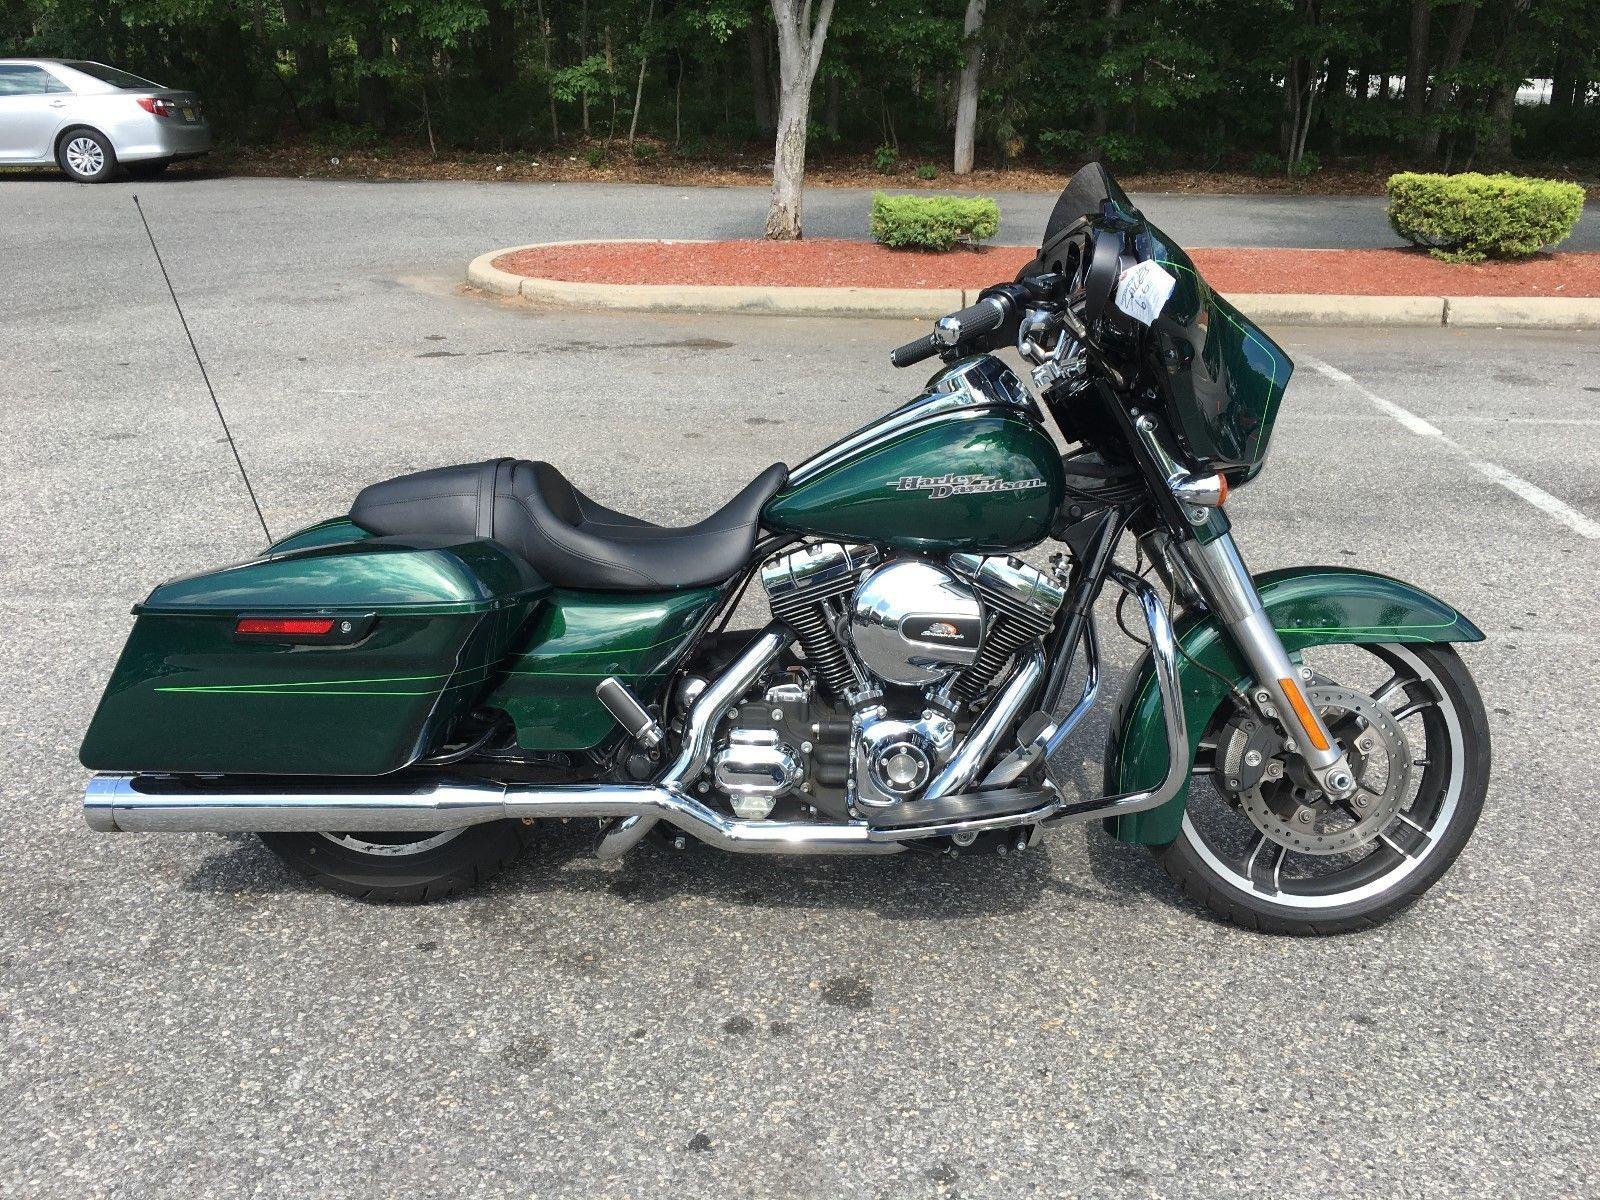 eBay: 2015 Harley-Davidson Touring 2015 HARLEY DAVIDSON STREET GLIDE